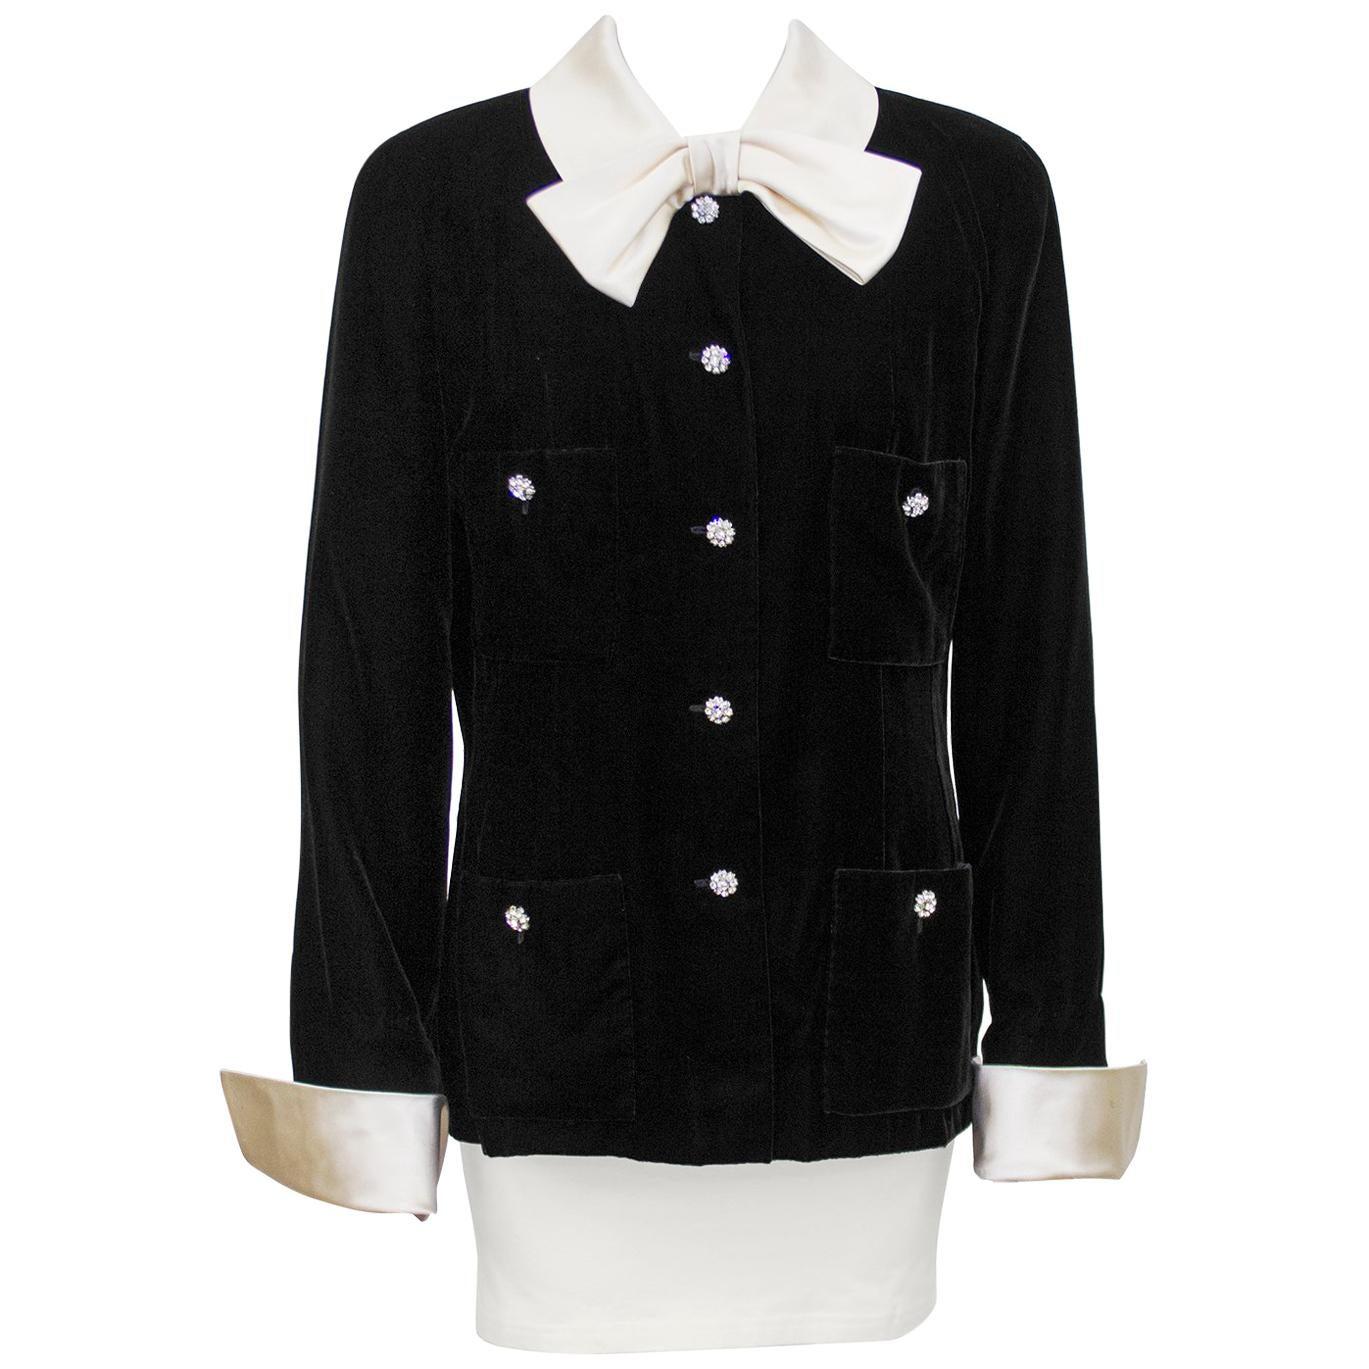 Late 1980s Chanel Black Velvet Jacket with Cream Satin Collar